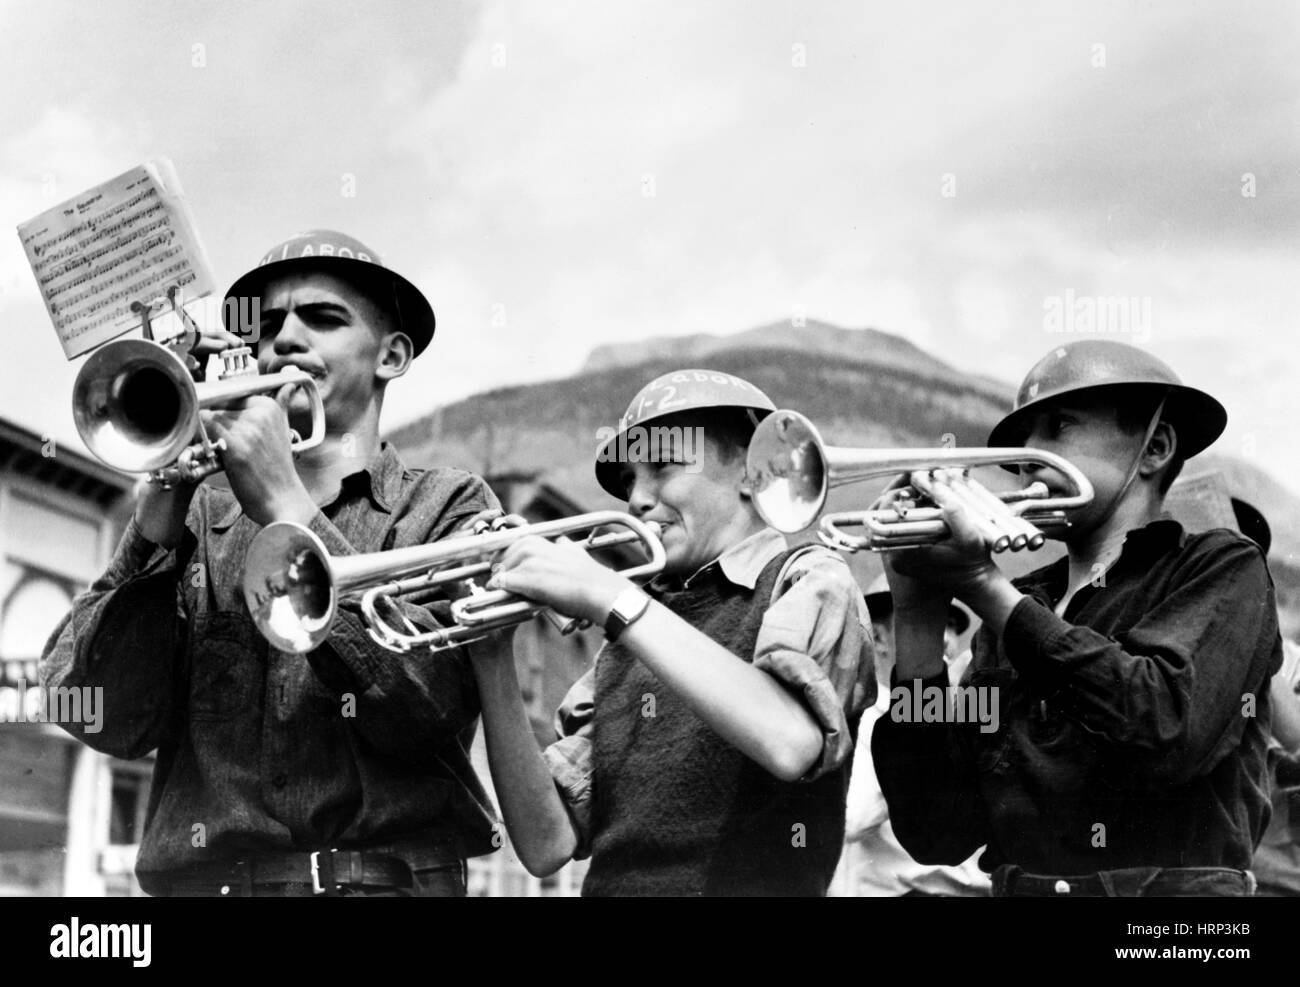 High School Band, Labor Day Celebration, 1940 - Stock Image